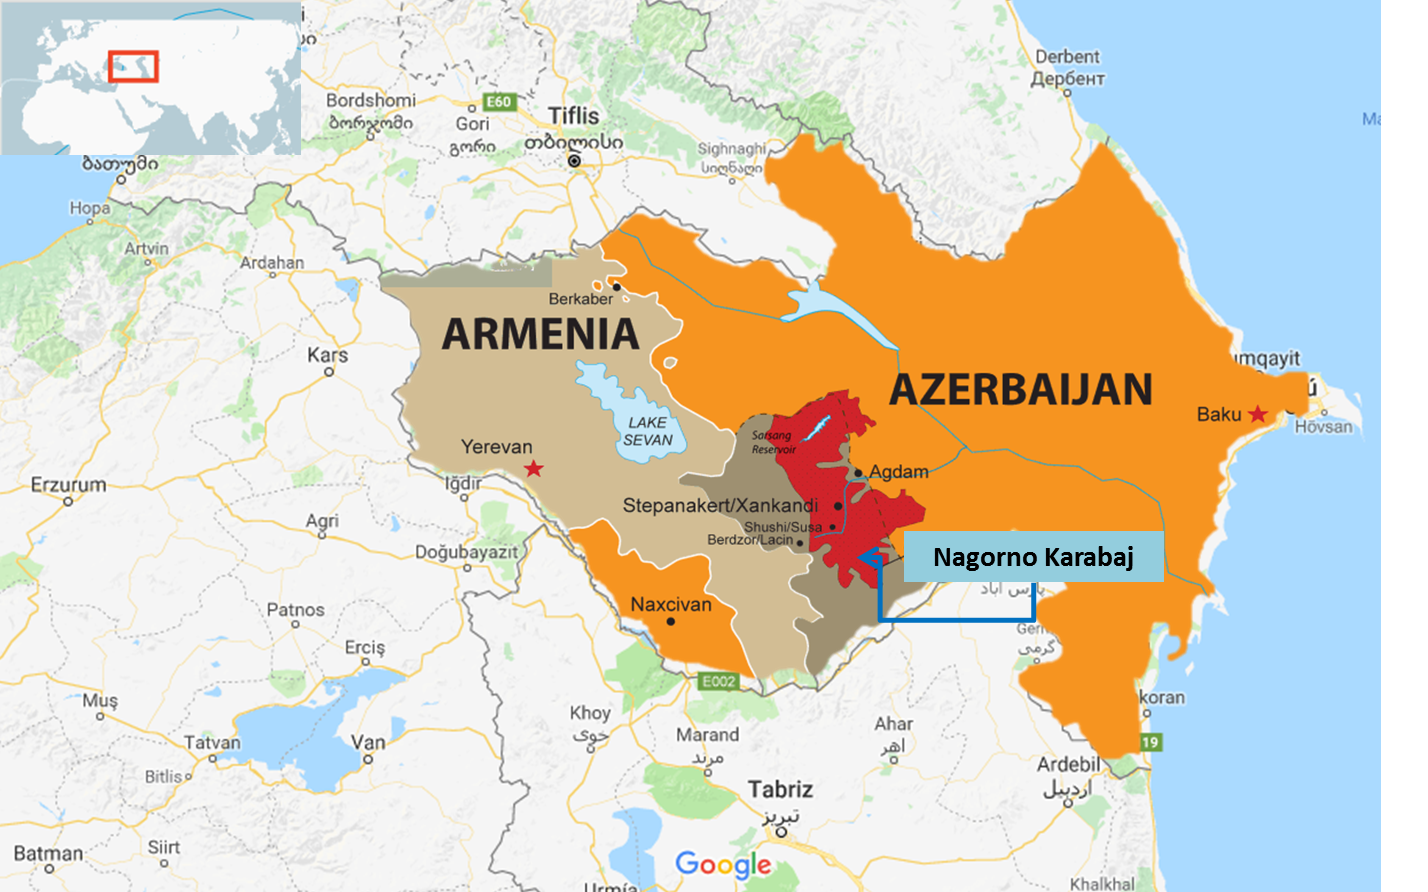 Mapa de Nagorno Karabaj